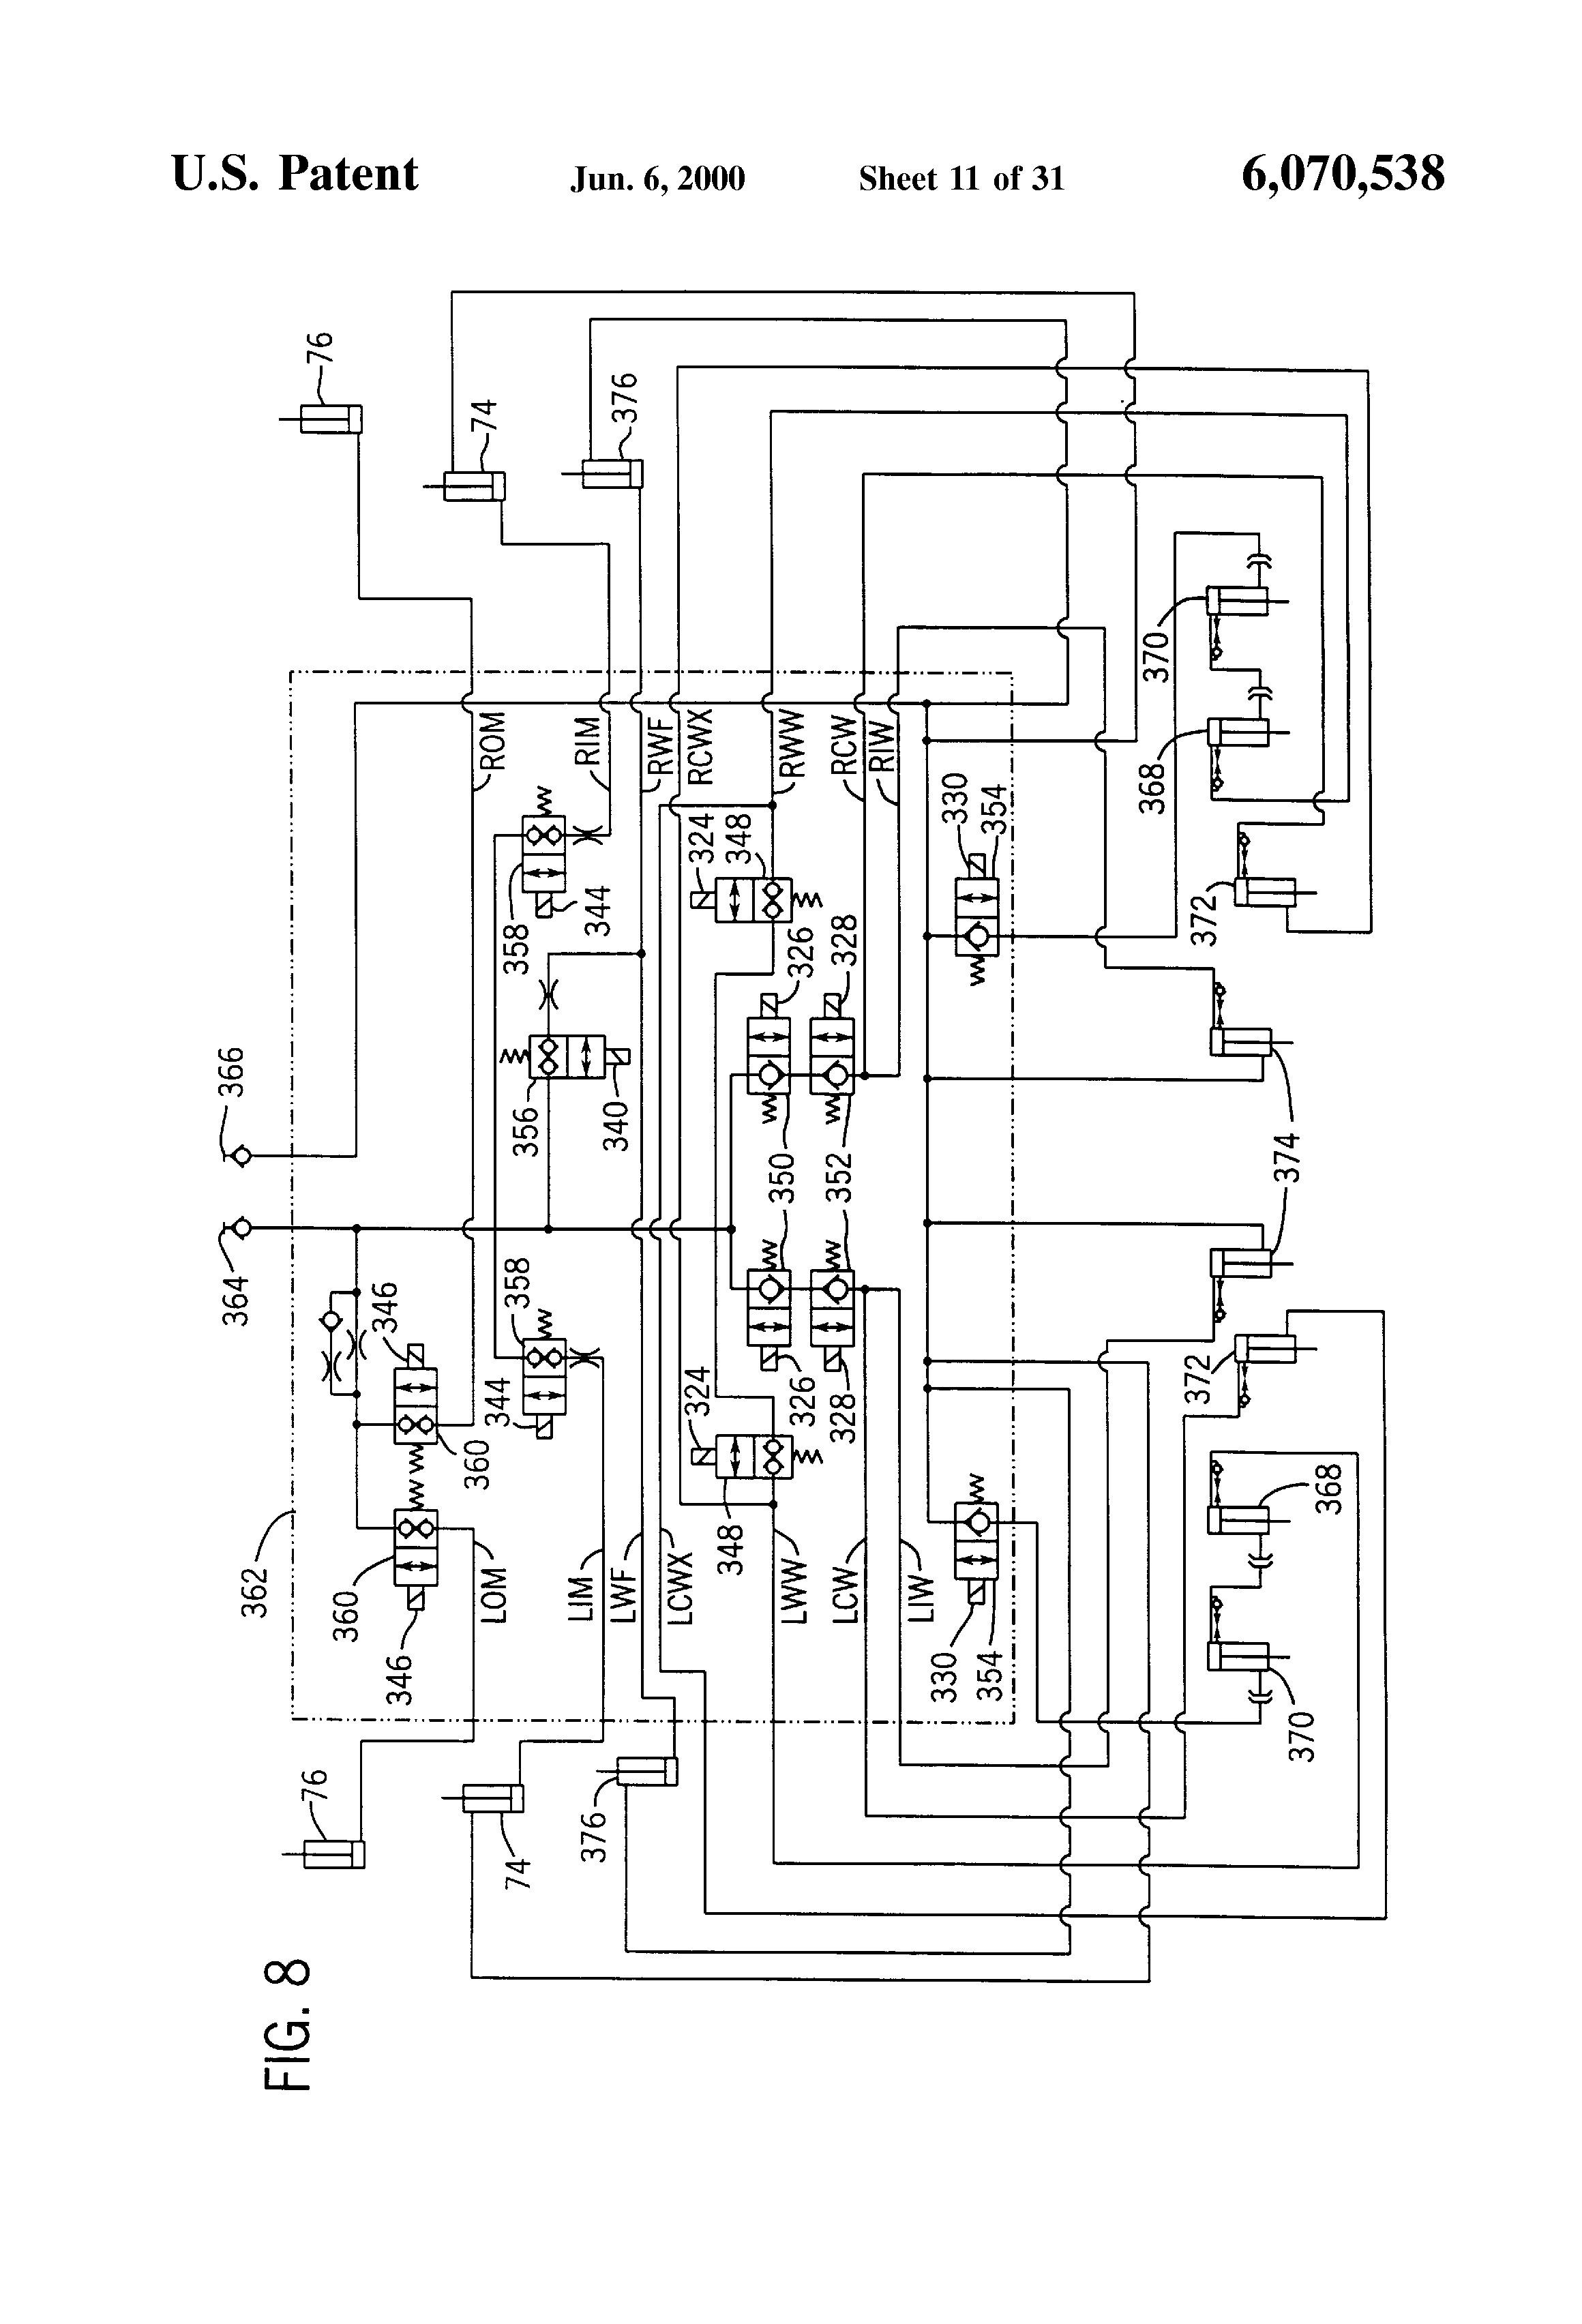 af_7458] international 234 tractor wiring diagram download diagram  hroni rosz rect omit kargi hone puti ixtu nowa orsal emba mohammedshrine  librar wiring 101